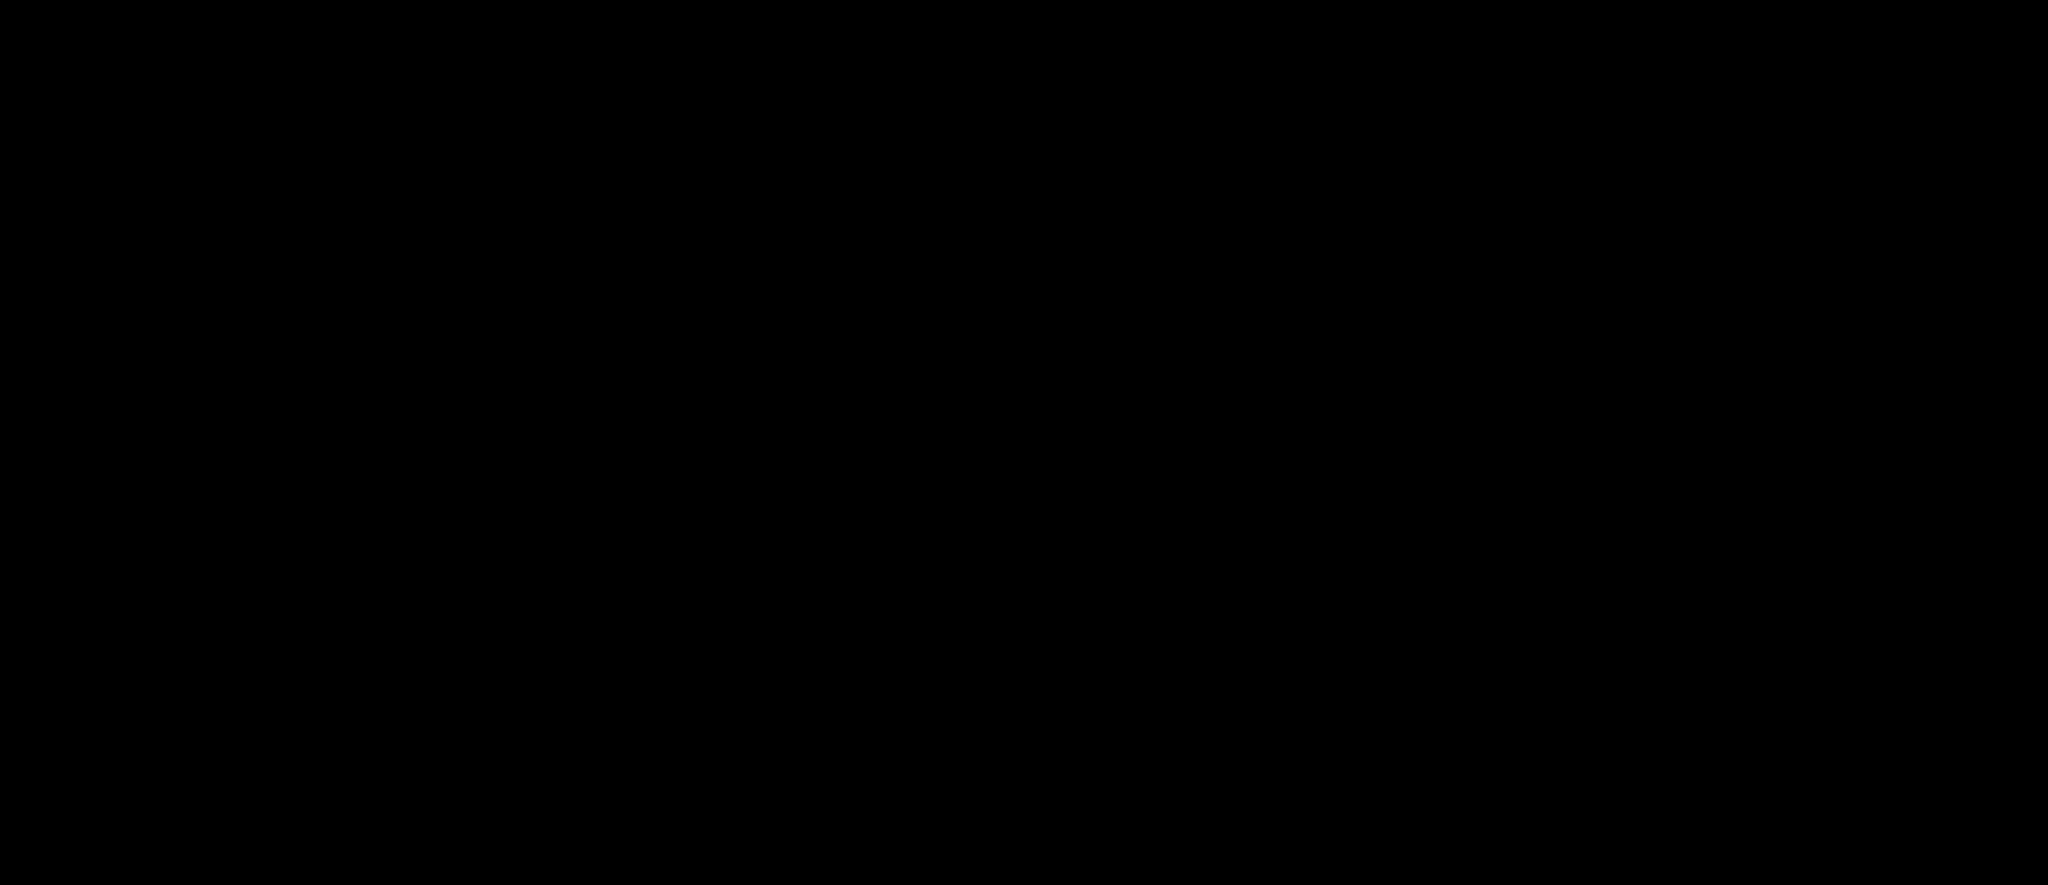 Kraai van de Febo